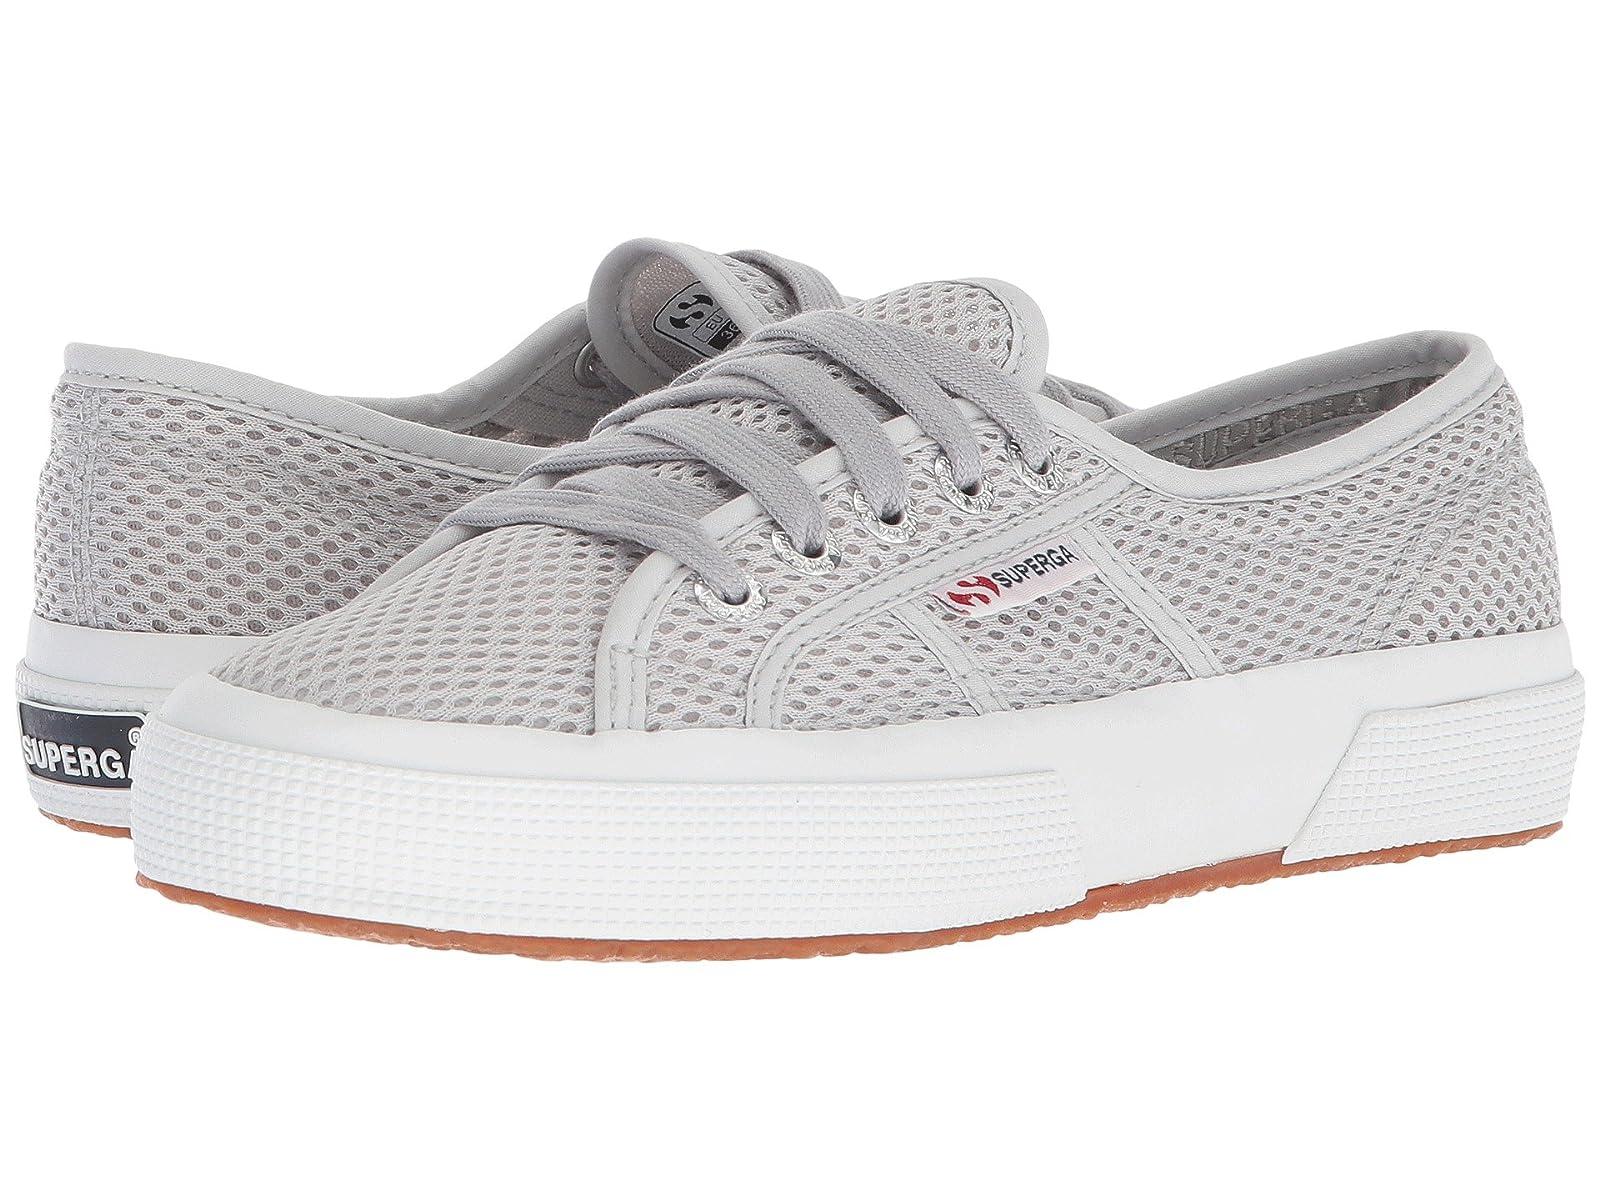 Superga 2750 Meshu SneakerCheap and distinctive eye-catching shoes